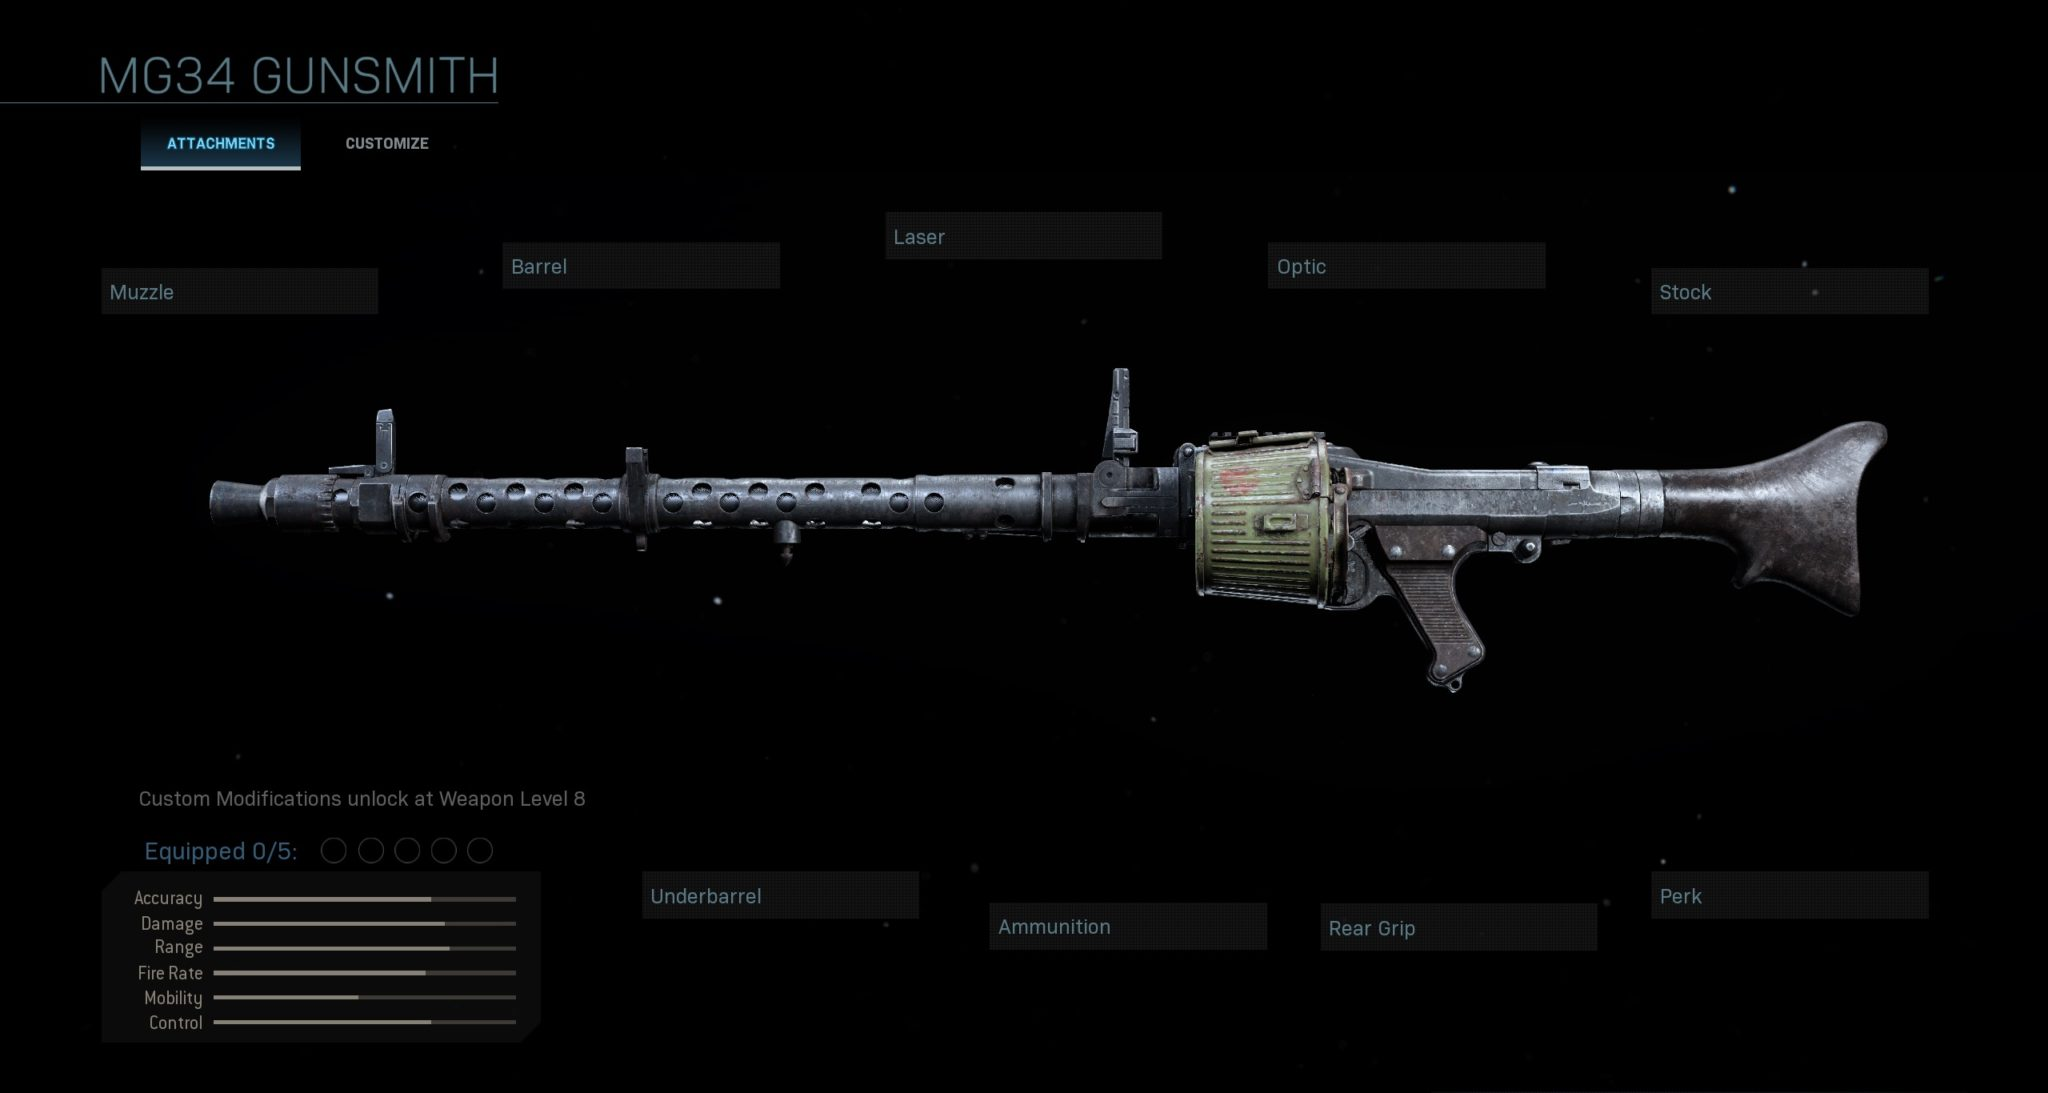 MG34 loadout screen